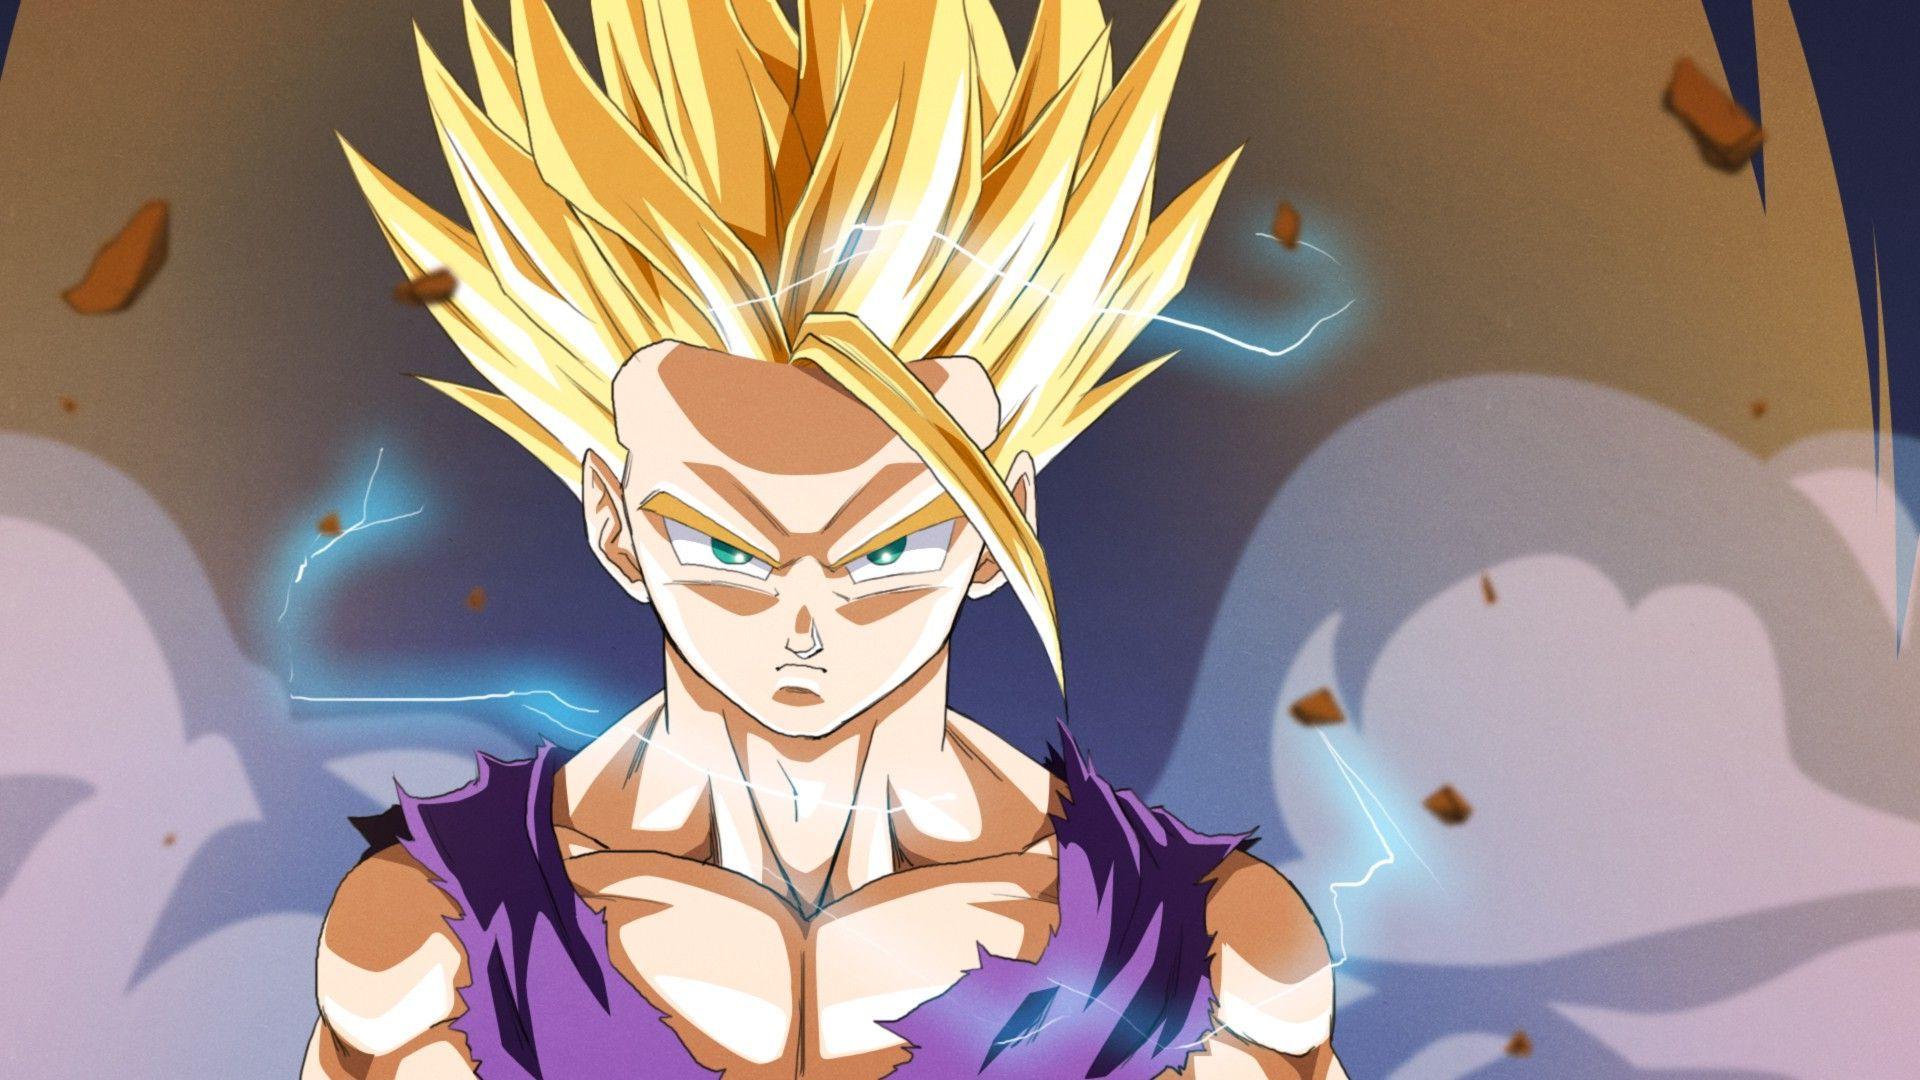 Super Saiyan Goku wallpaper   1033836 1920x1080